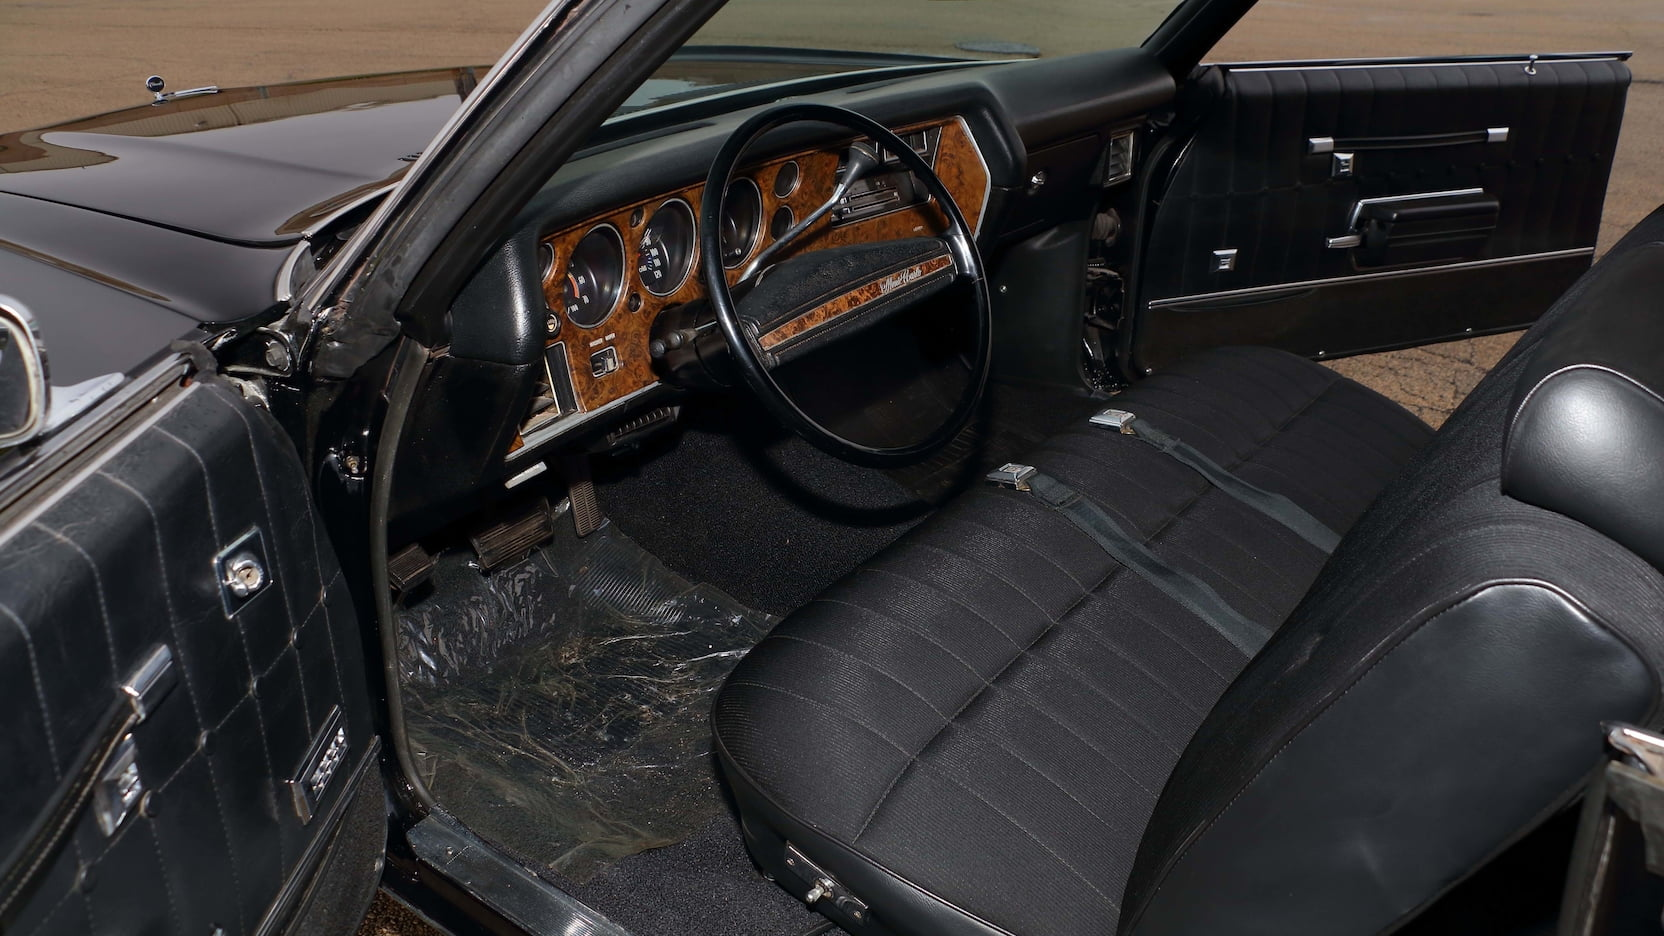 1971 Chevrolet Monte Carlo SS interior